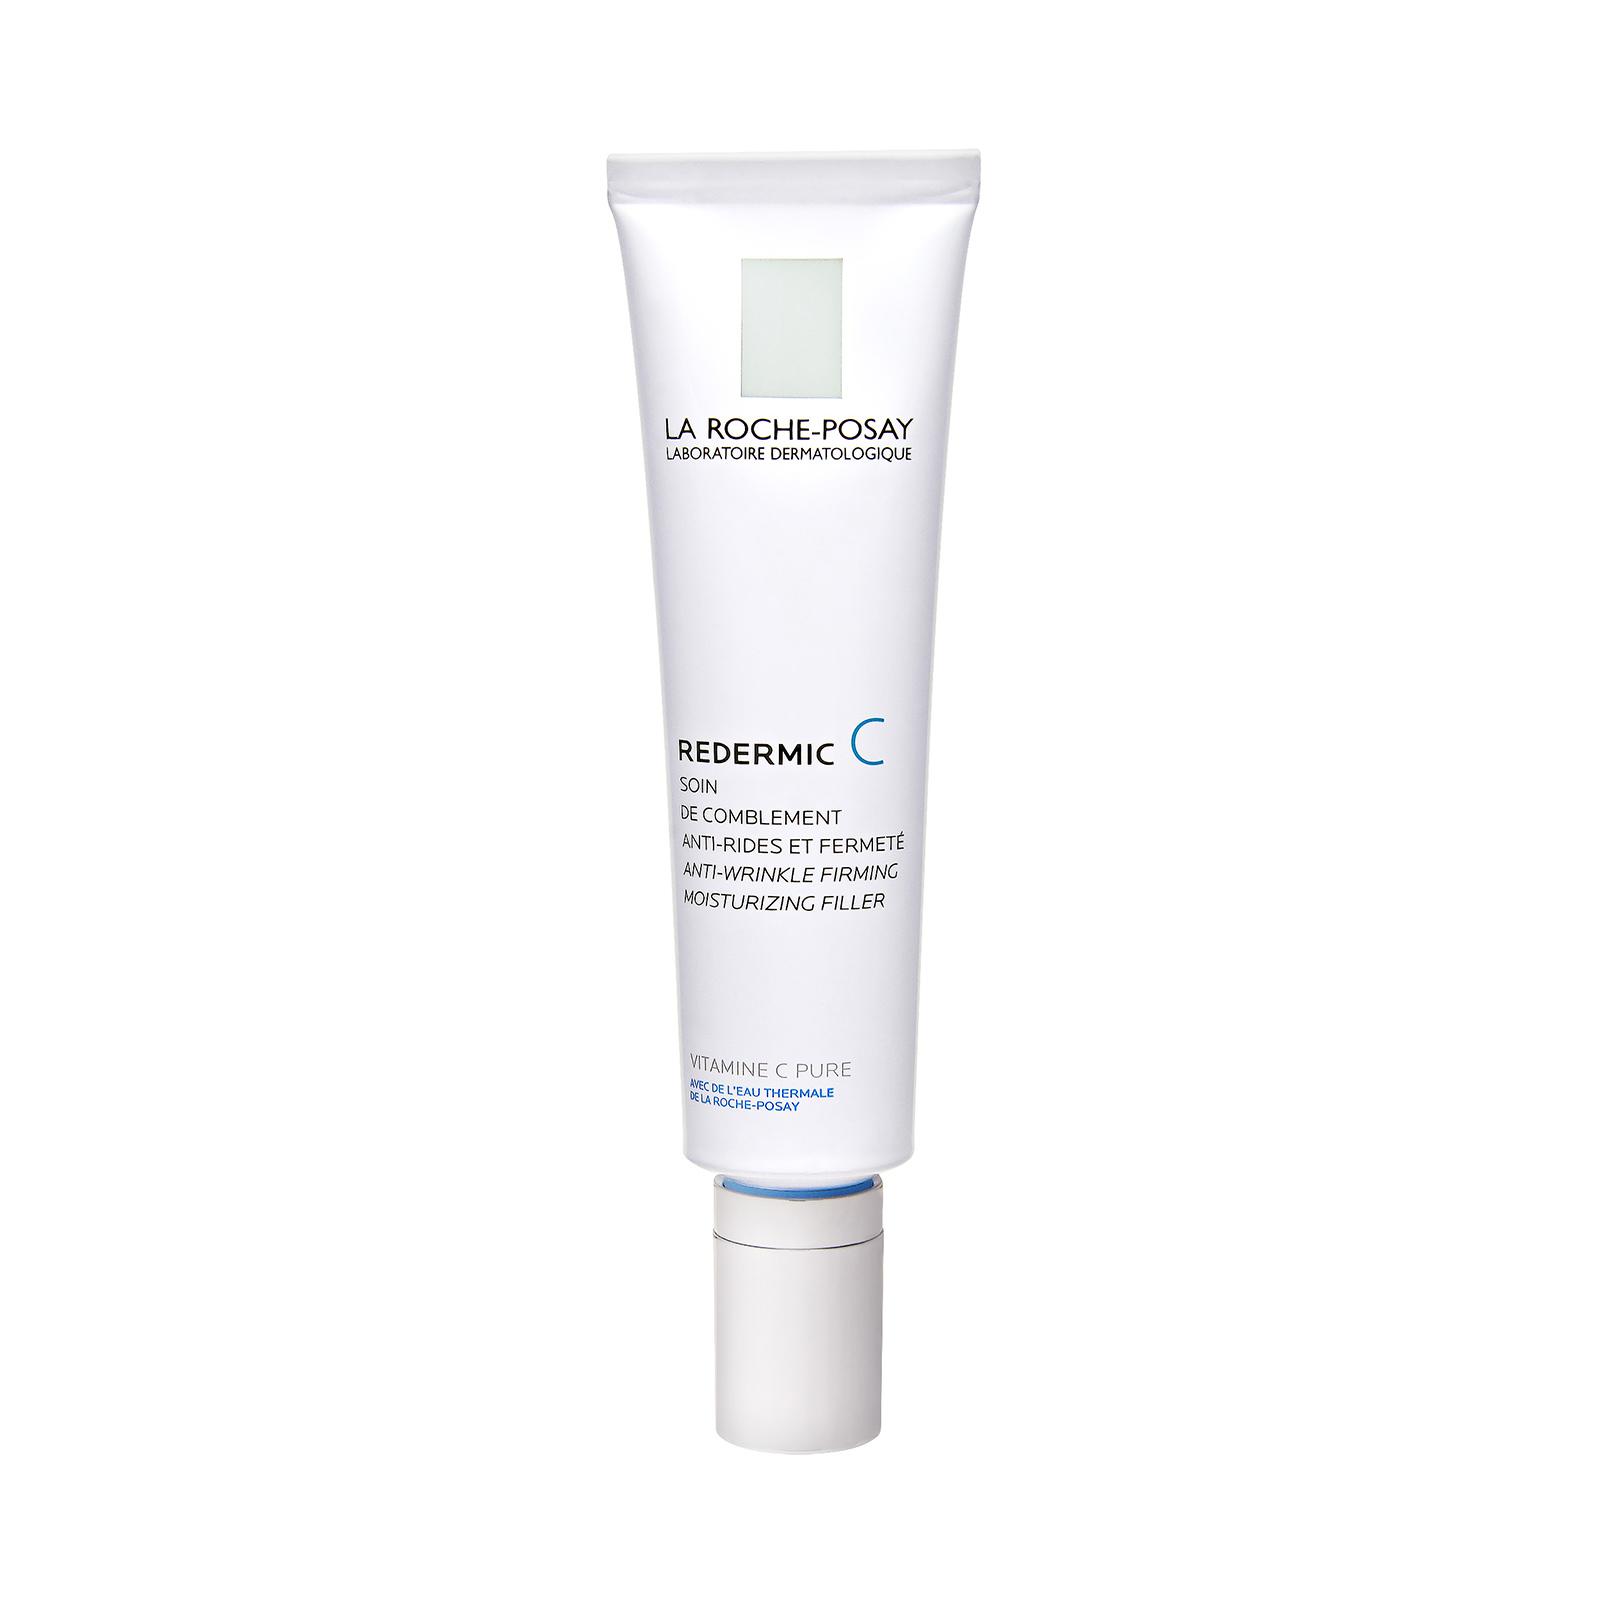 La Roche-Posay Redermic [C] Anti-Aging Sensitive Skin Fill-In Care (Normal to Combination Skin) 40ml, from Cosme-De.com